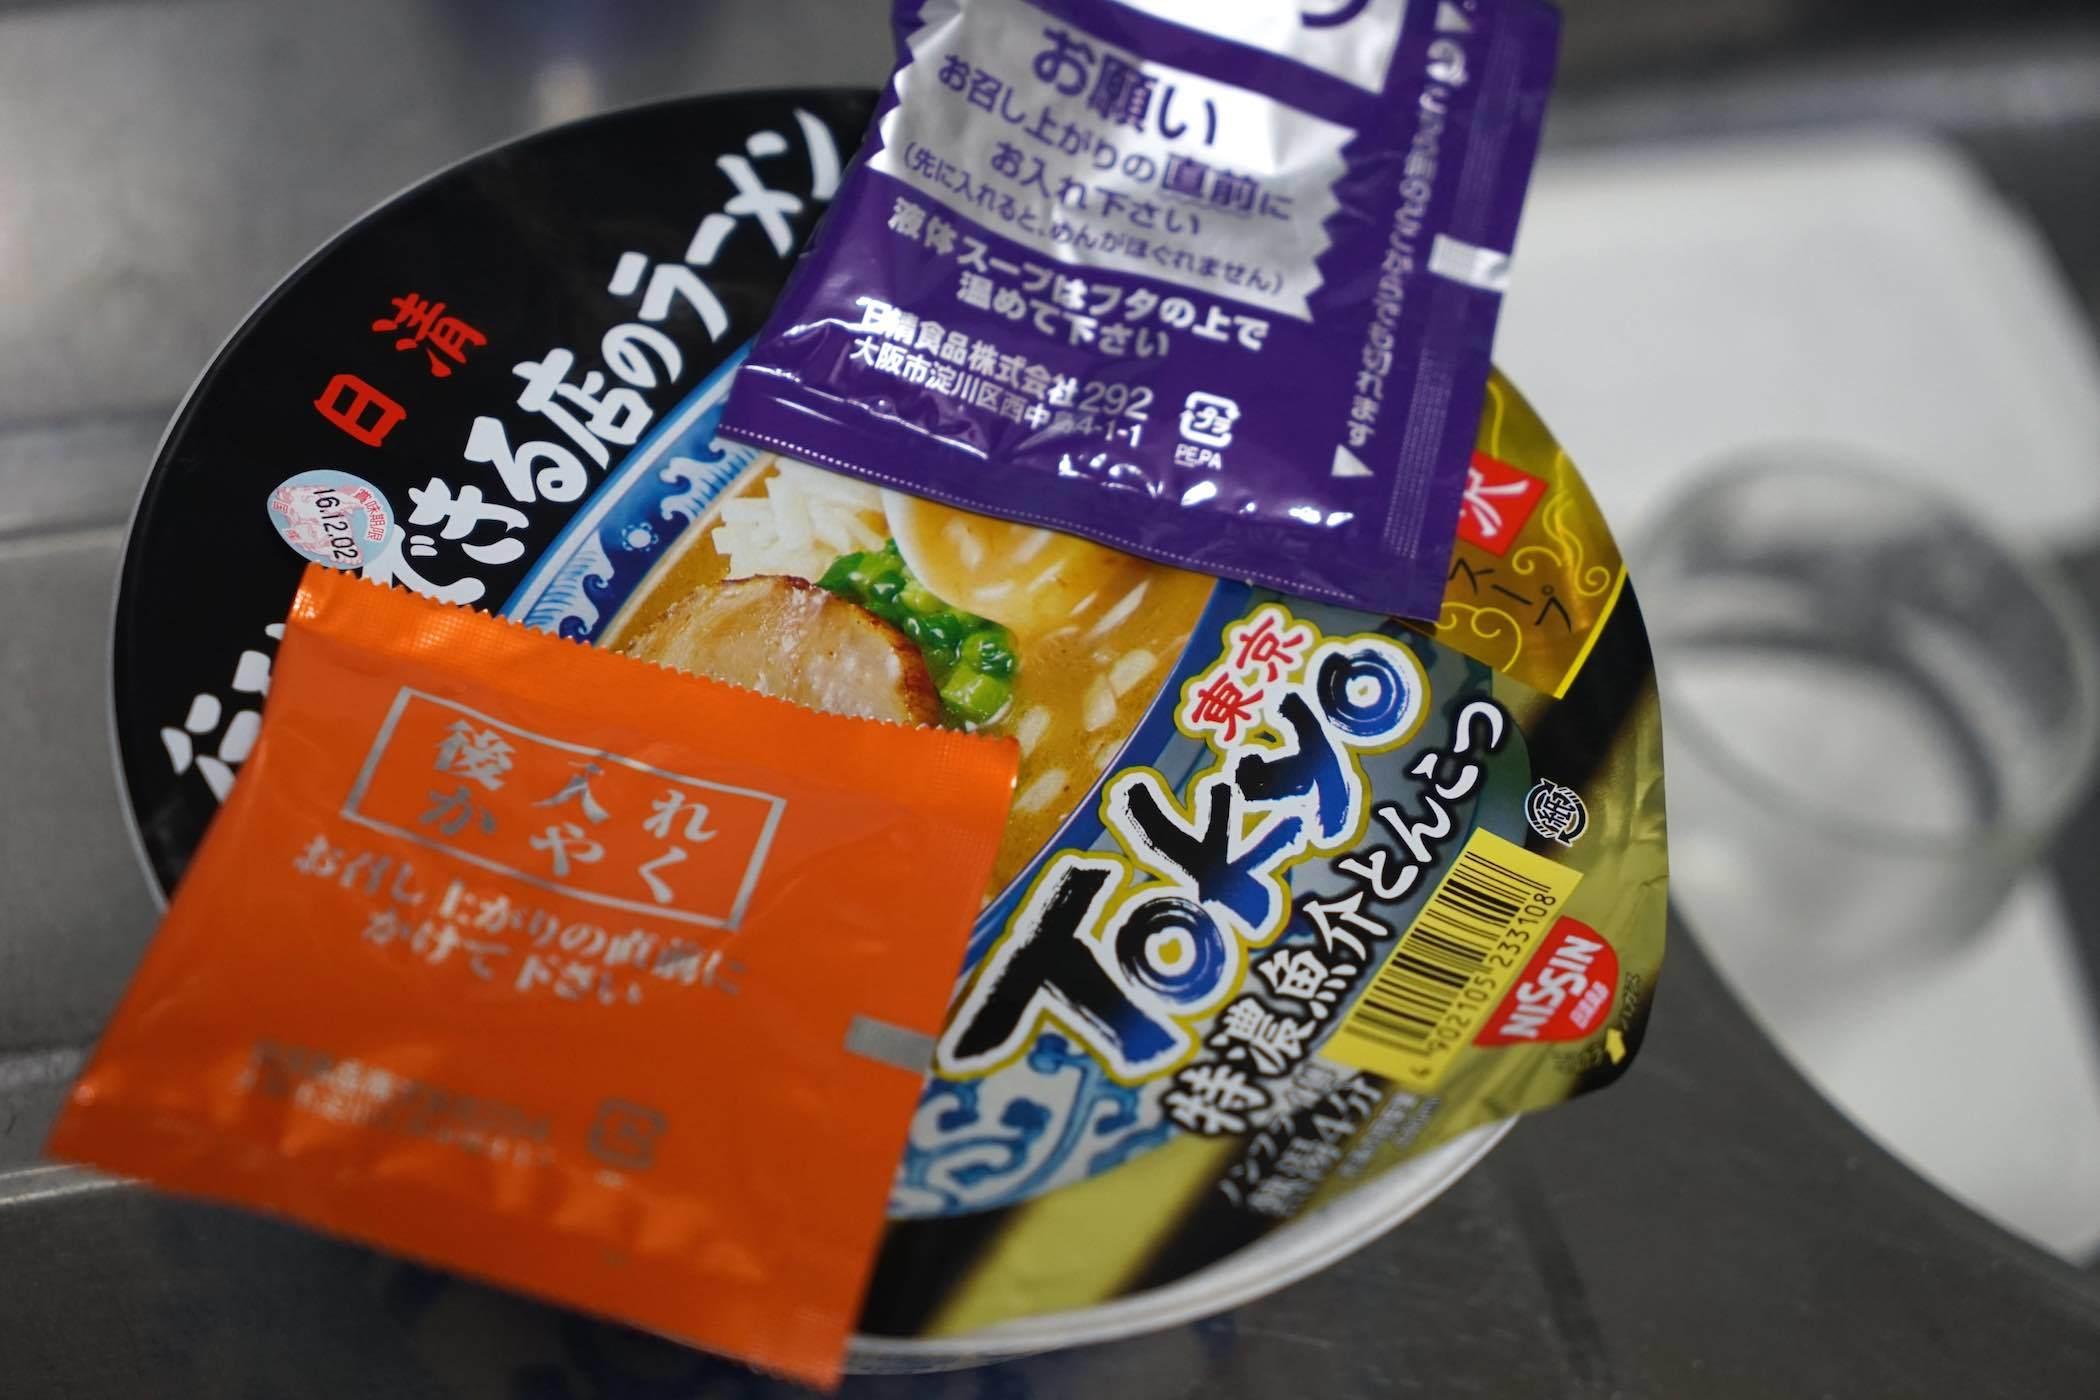 SEPもちもちの木、ラ王魚介豚骨醤油、TOKYO特濃魚介とんこつ_b0360240_22040462.jpg